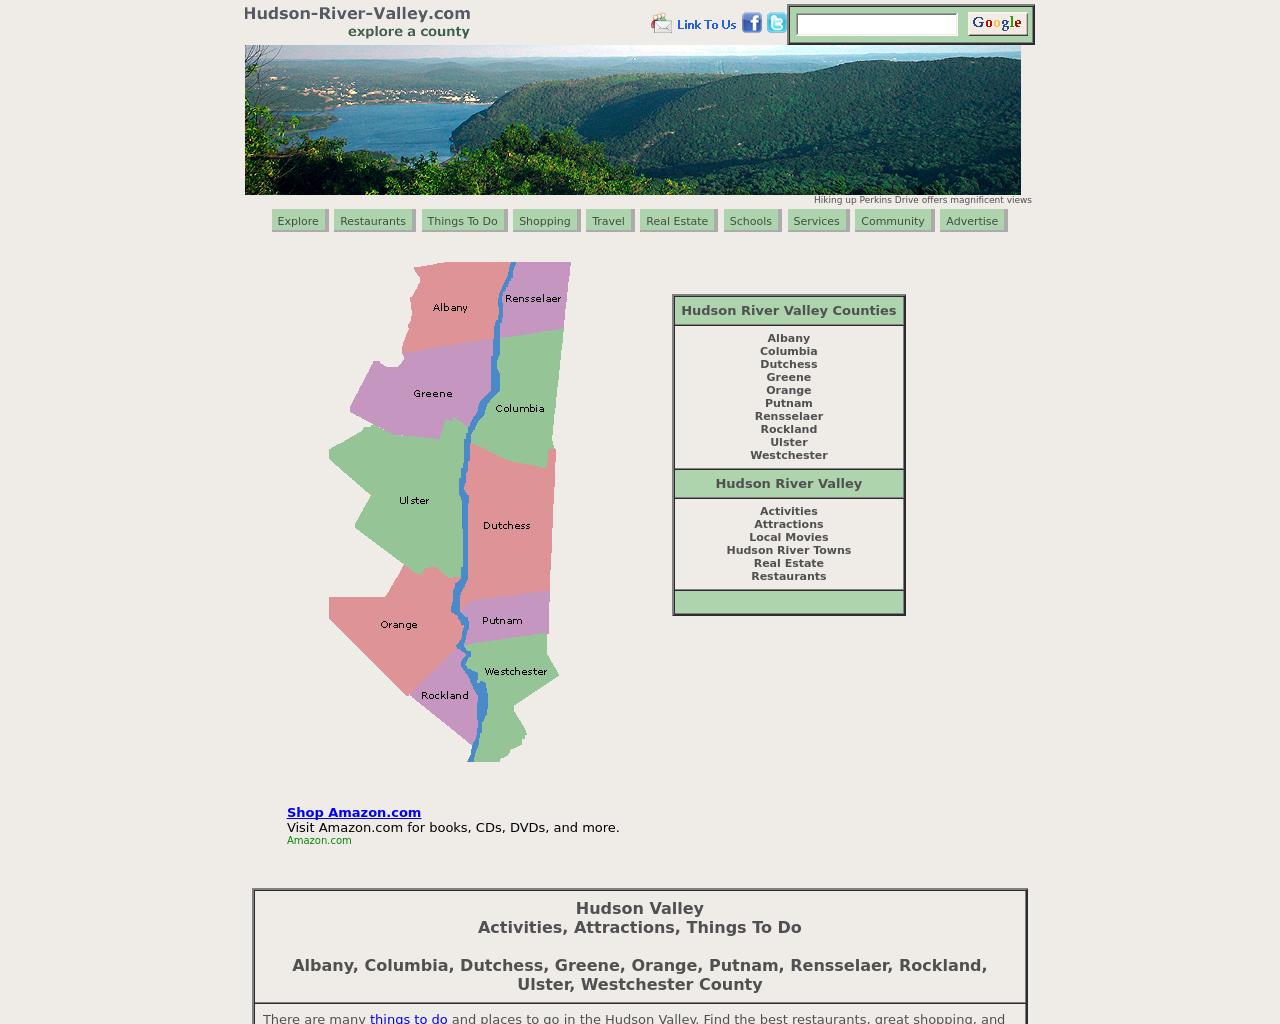 Hudson-River-Valley-Advertising-Reviews-Pricing